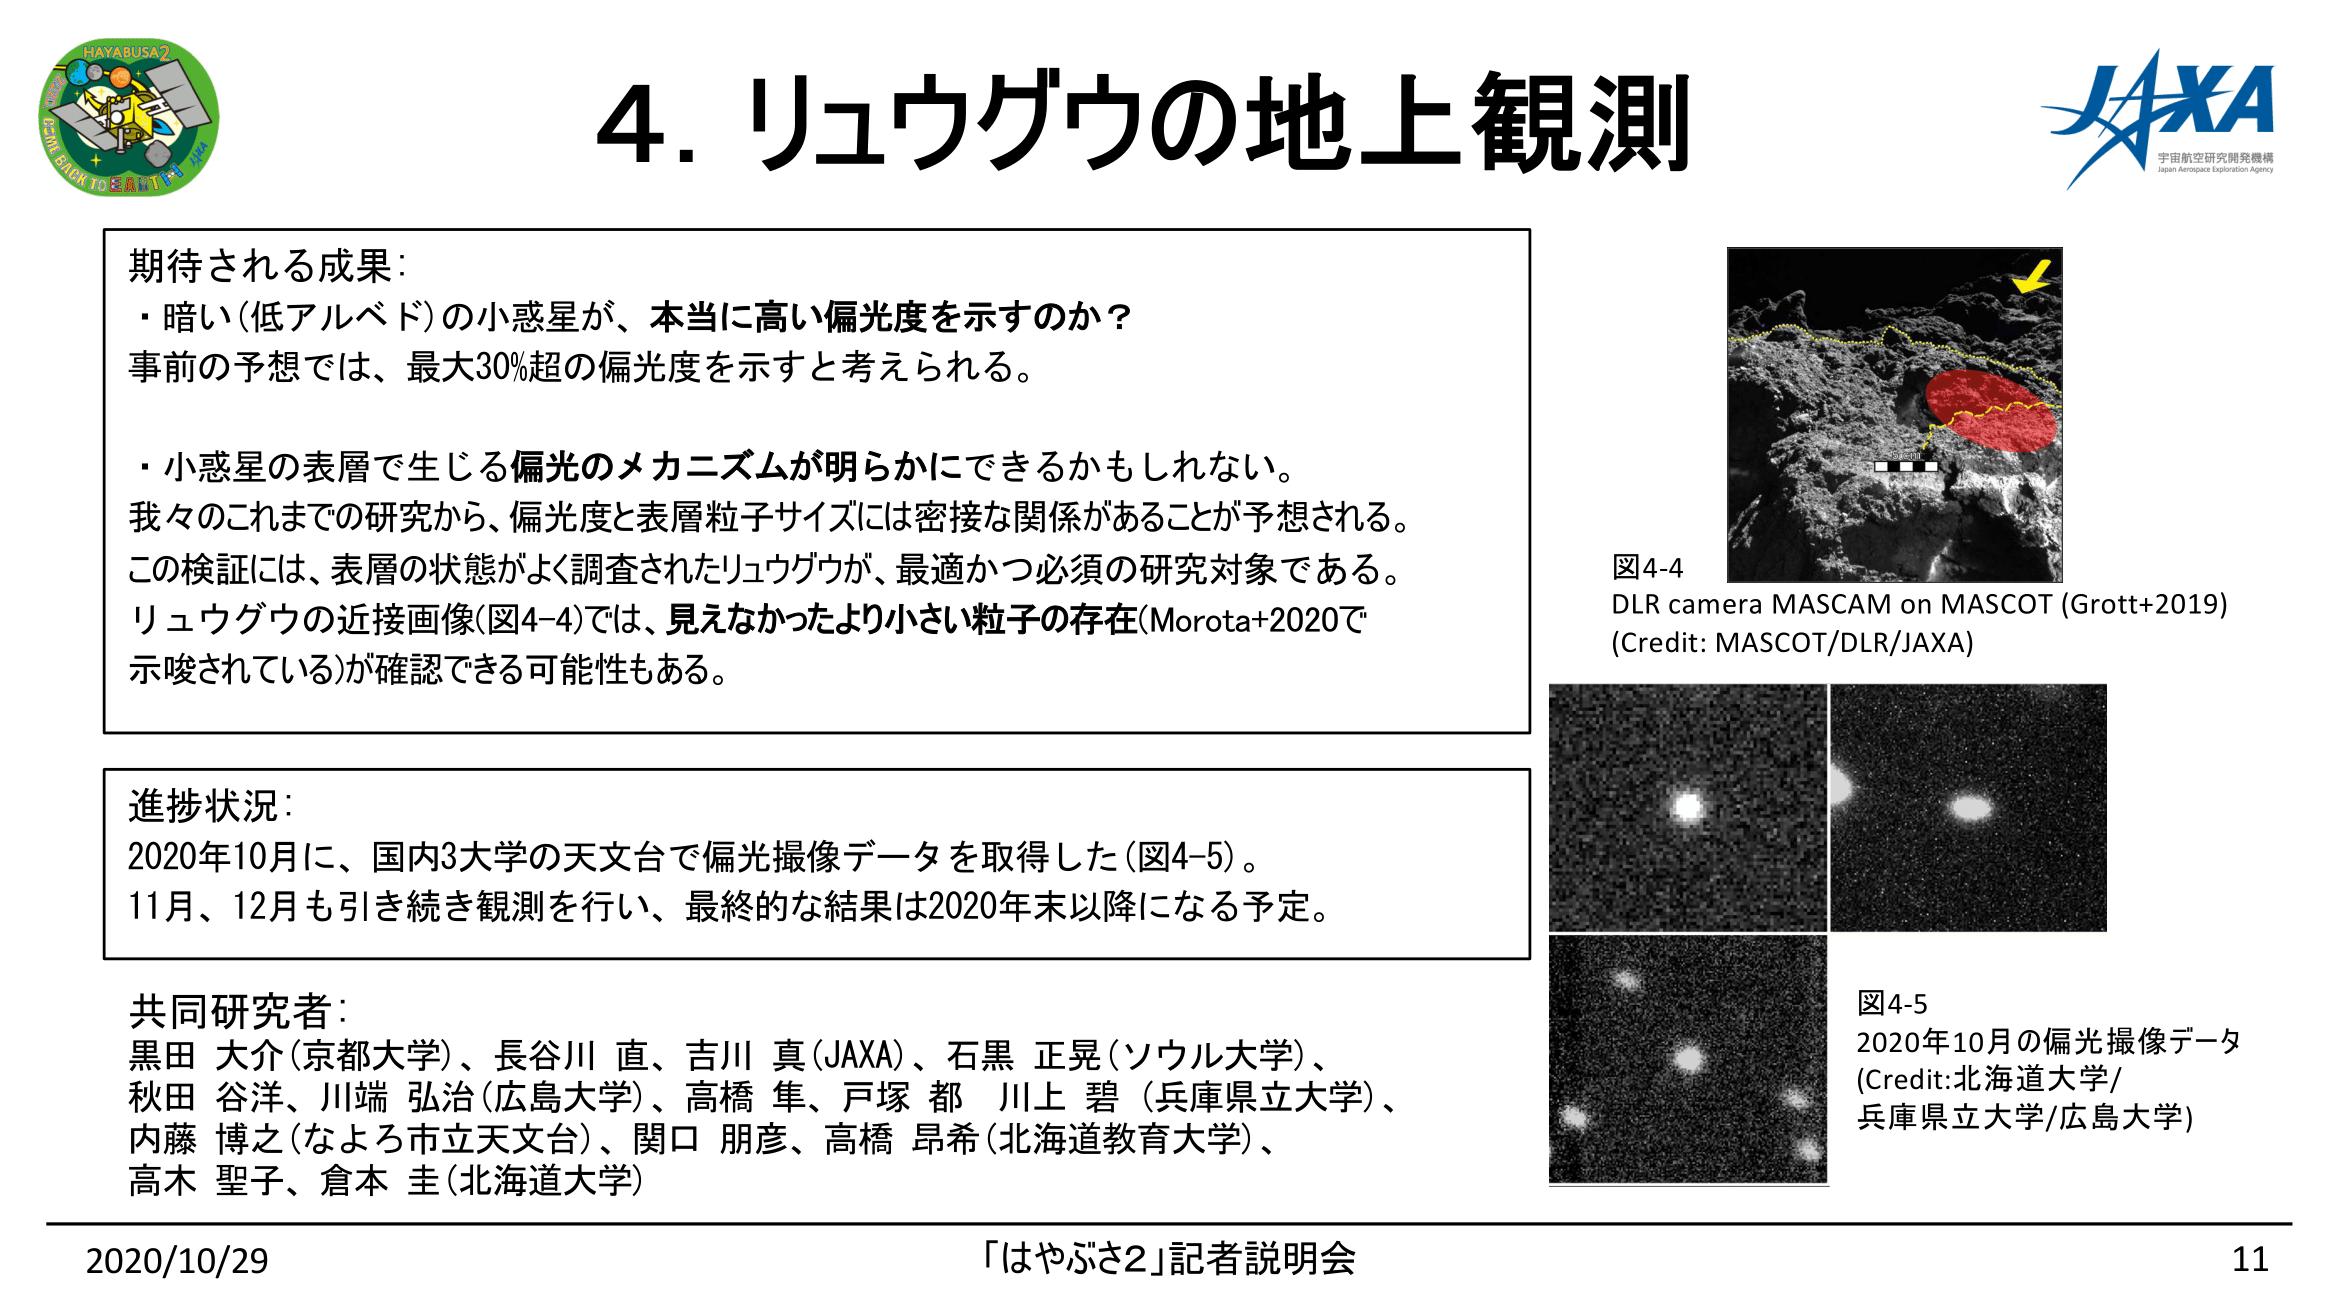 f:id:Imamura:20201029161329p:plain